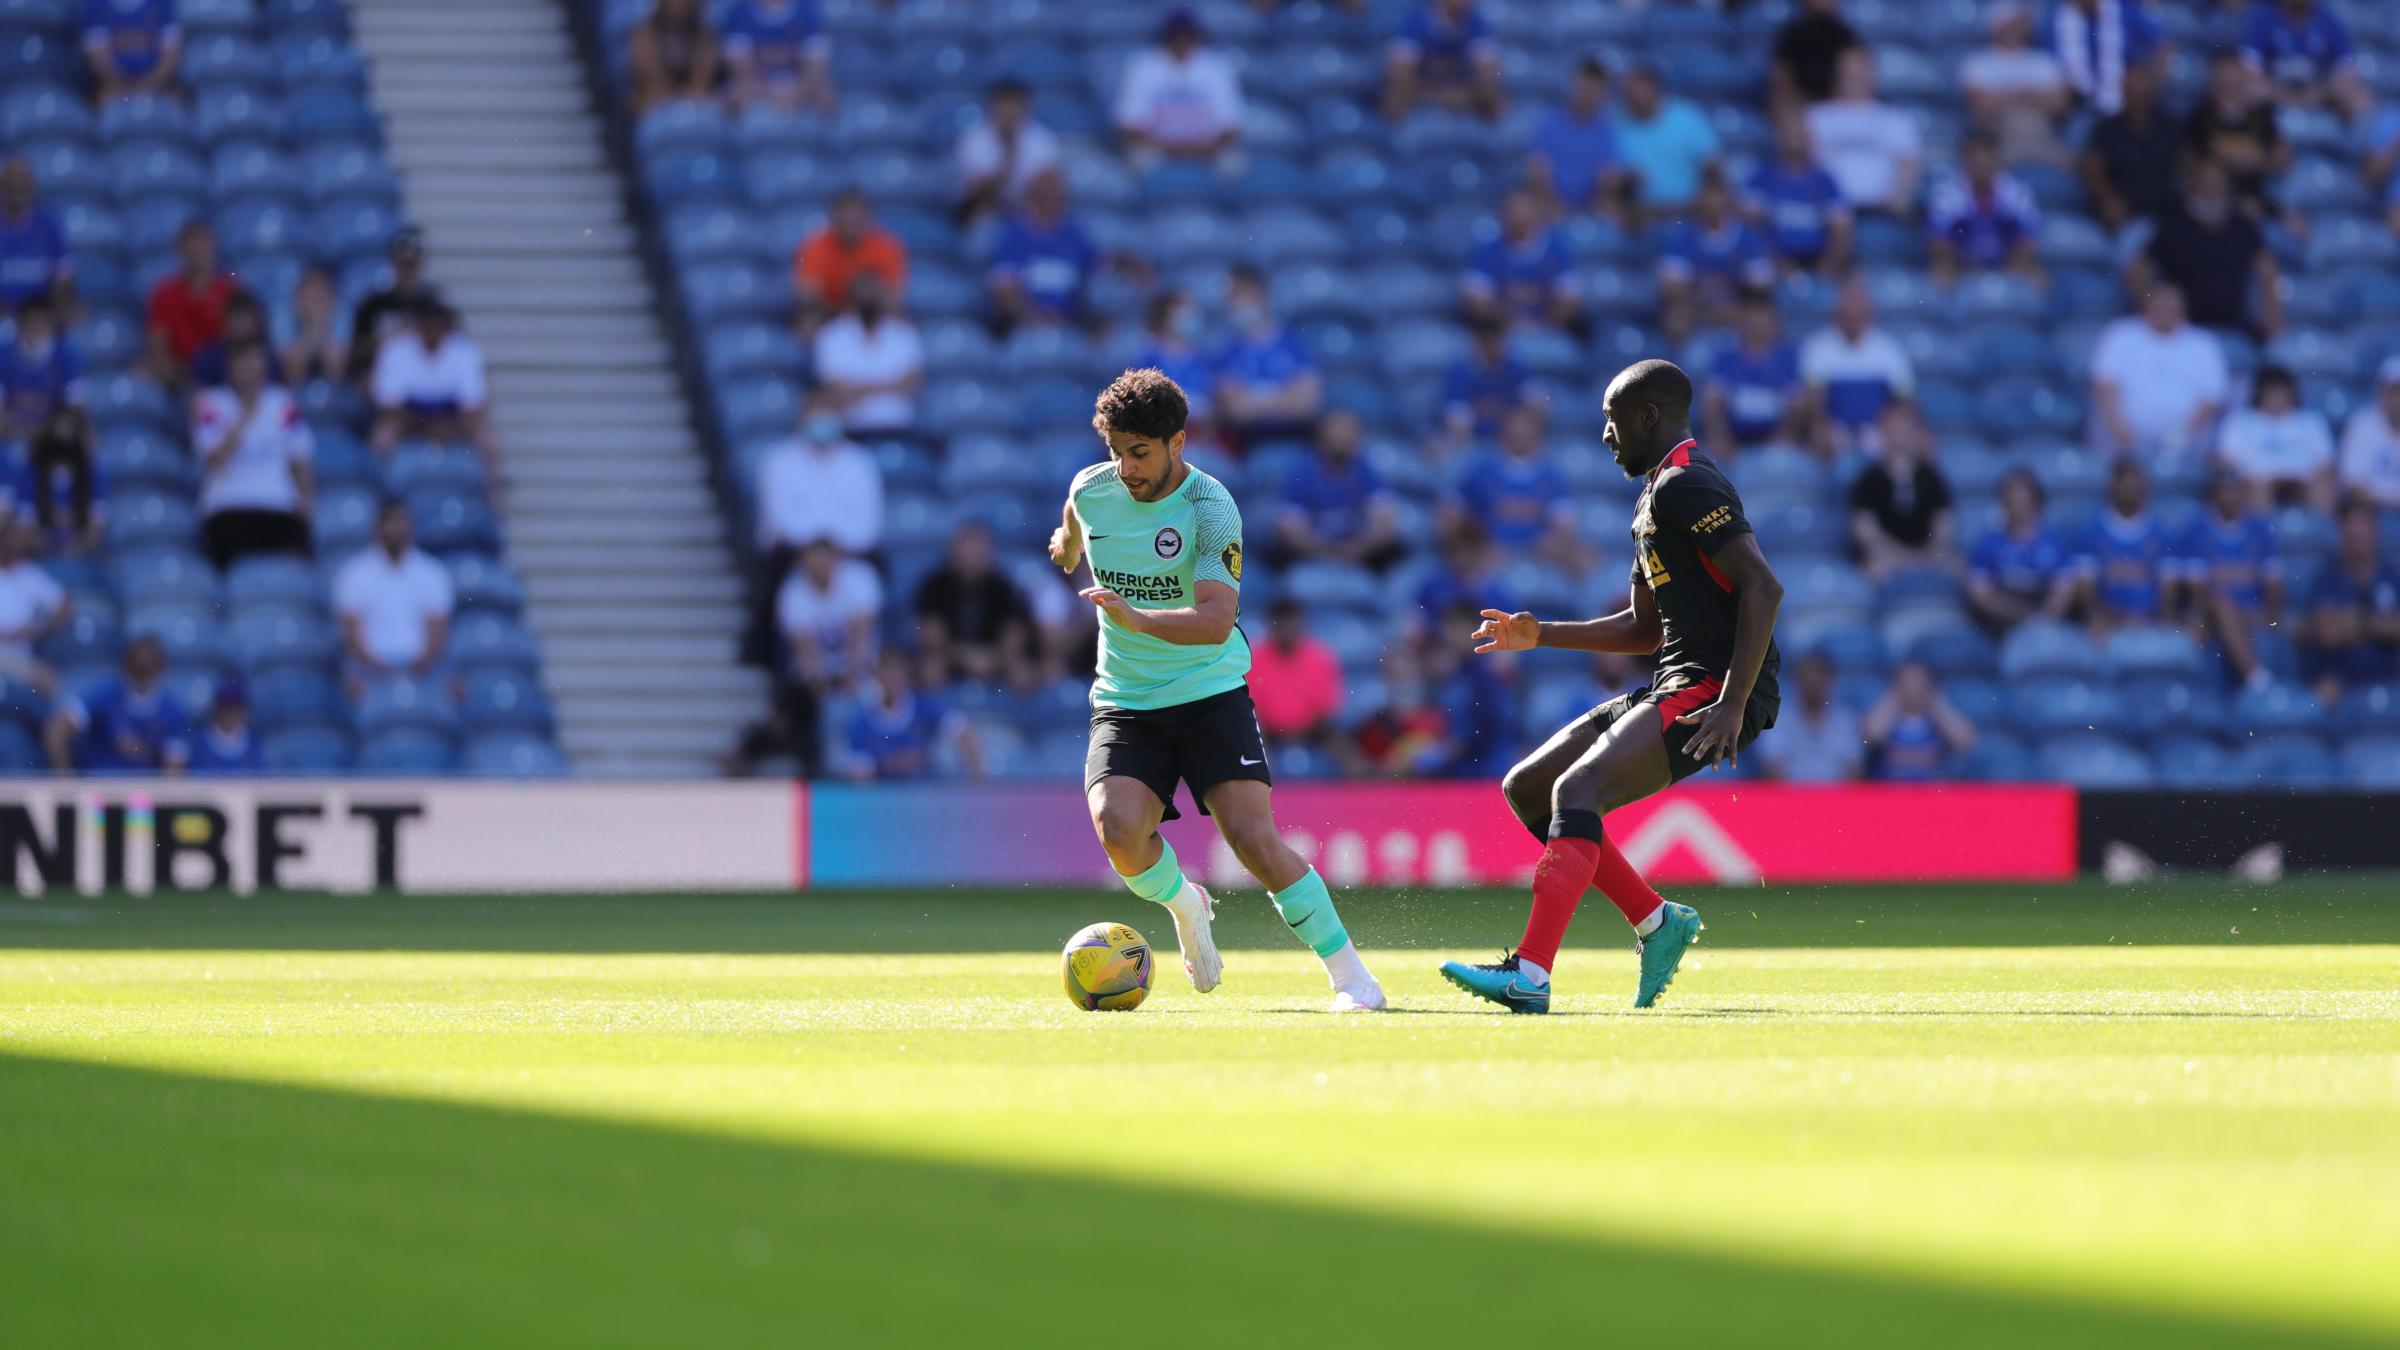 Brighton's Reda Khadra is set to finalise loan move to Blackburn Rovers